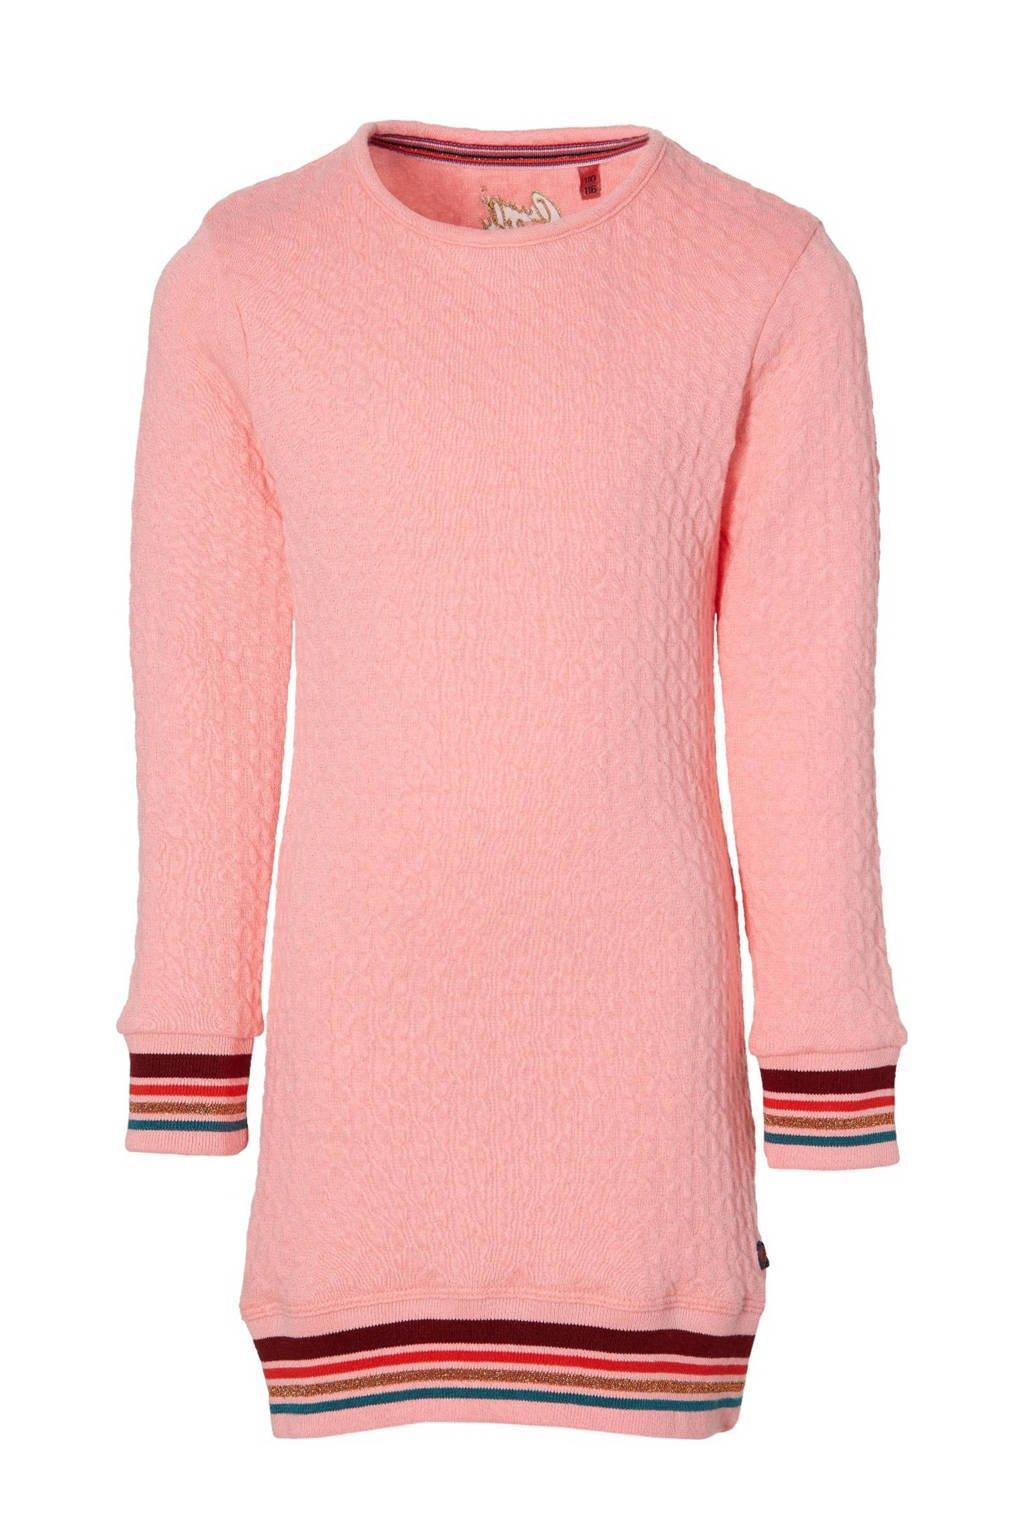 Quapi Girls jurk Daphna roze, Roze